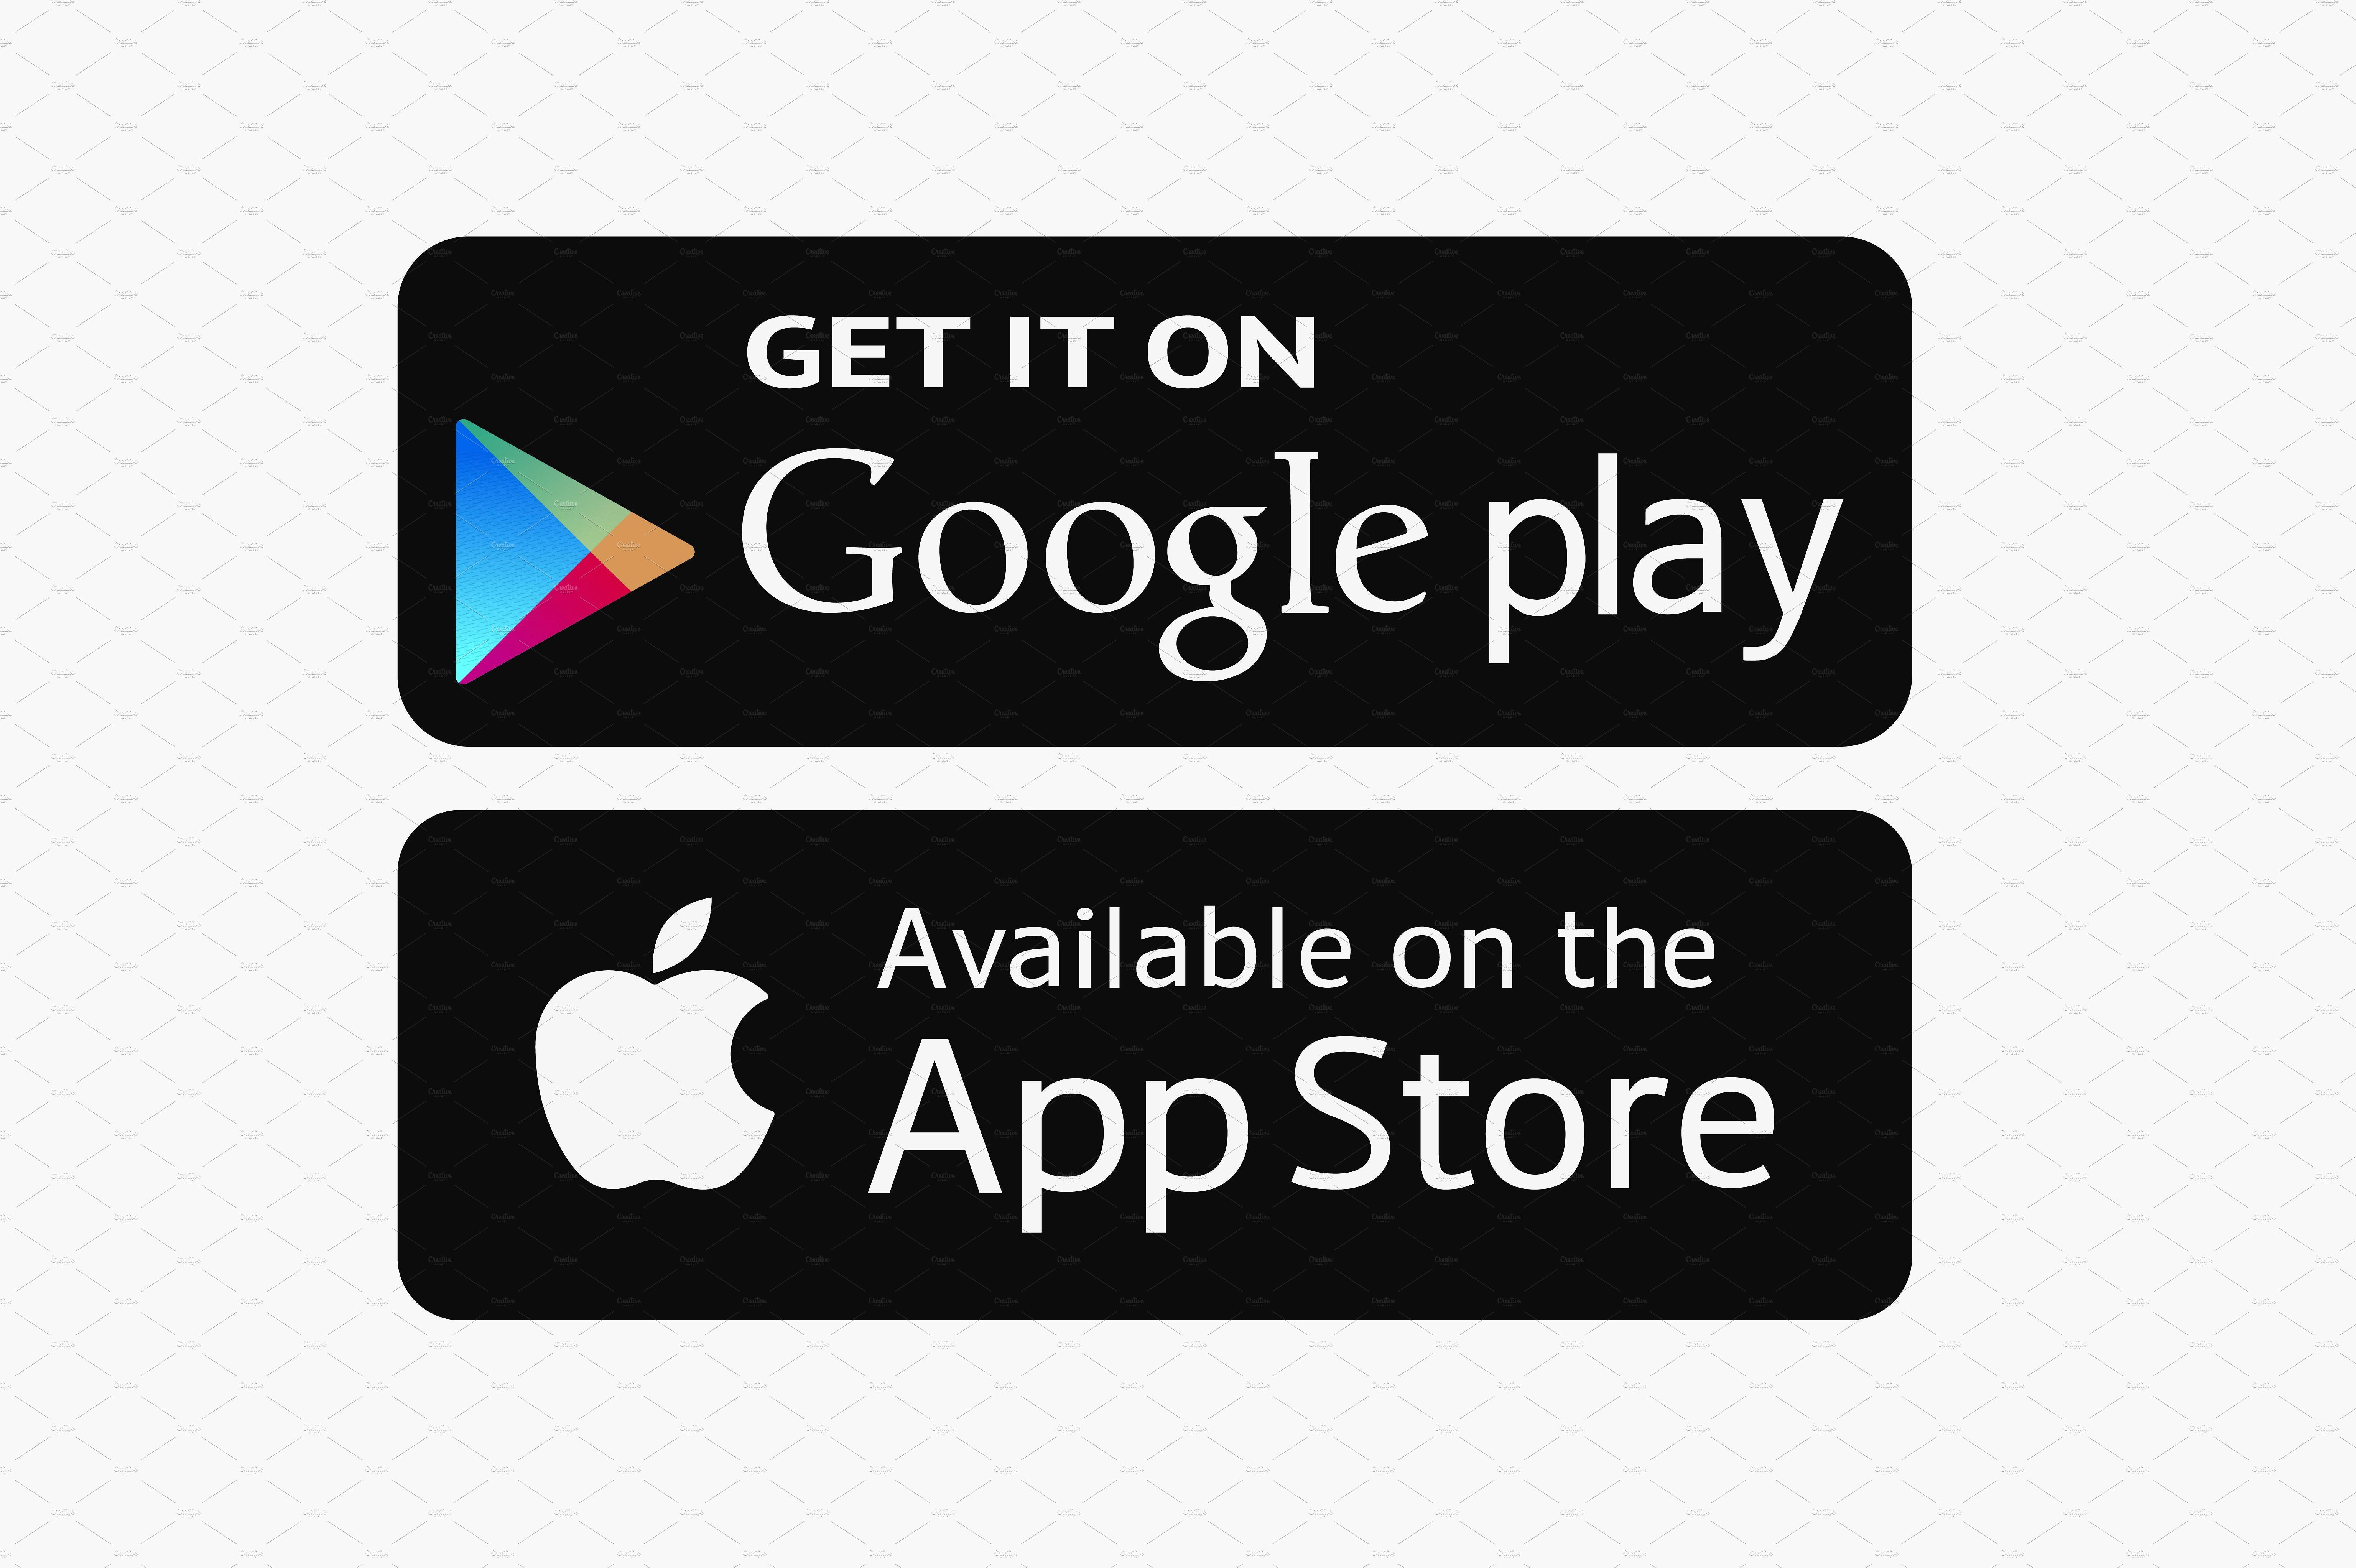 Google Apple Store Apple Store Apple Google